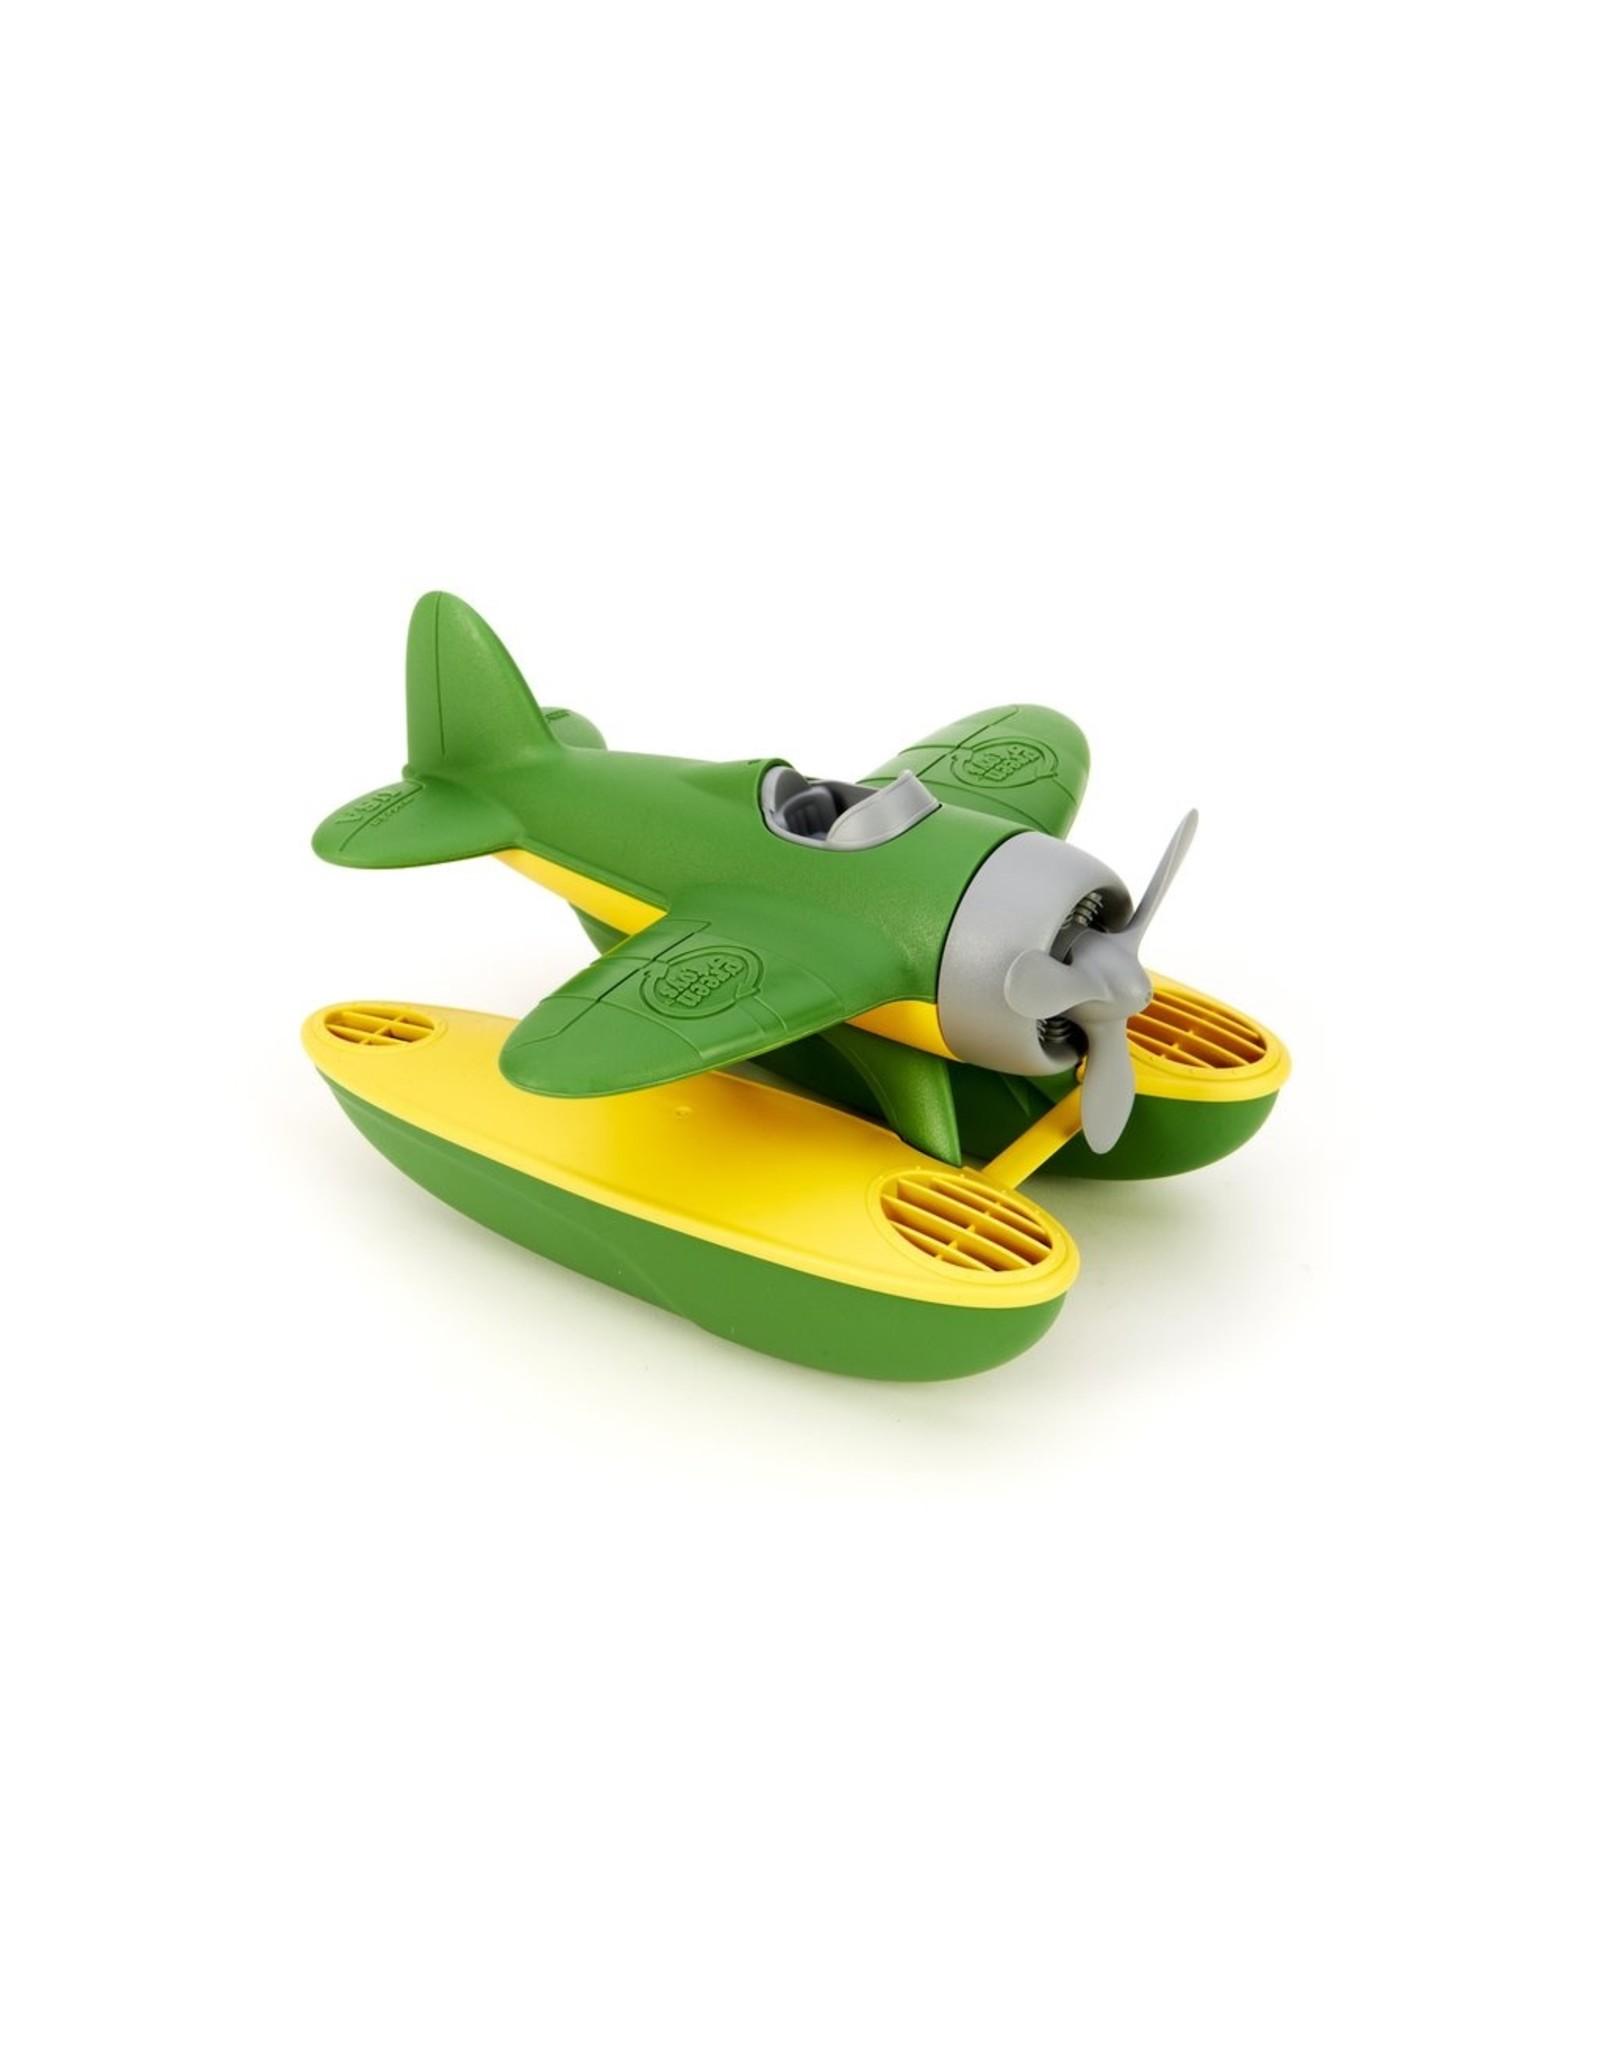 Green Toys GT Seaplane floats